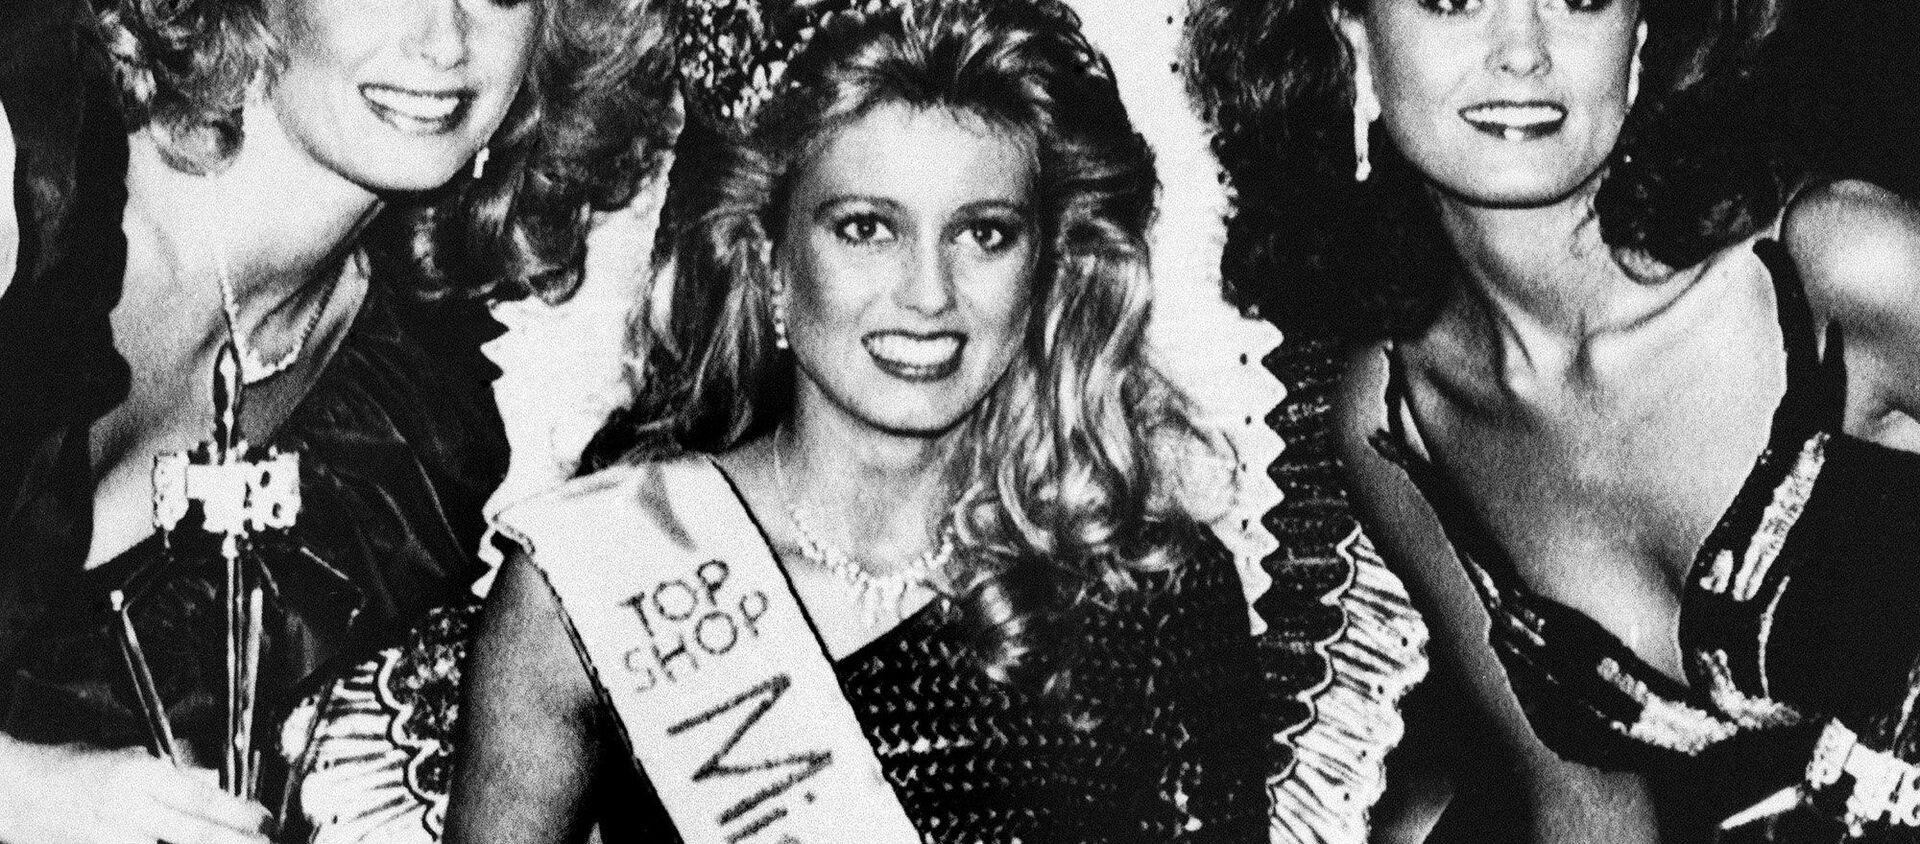 Miss World - 1985 Hofi Karlsdottir z Islandii - Sputnik Polska, 1920, 10.09.2016